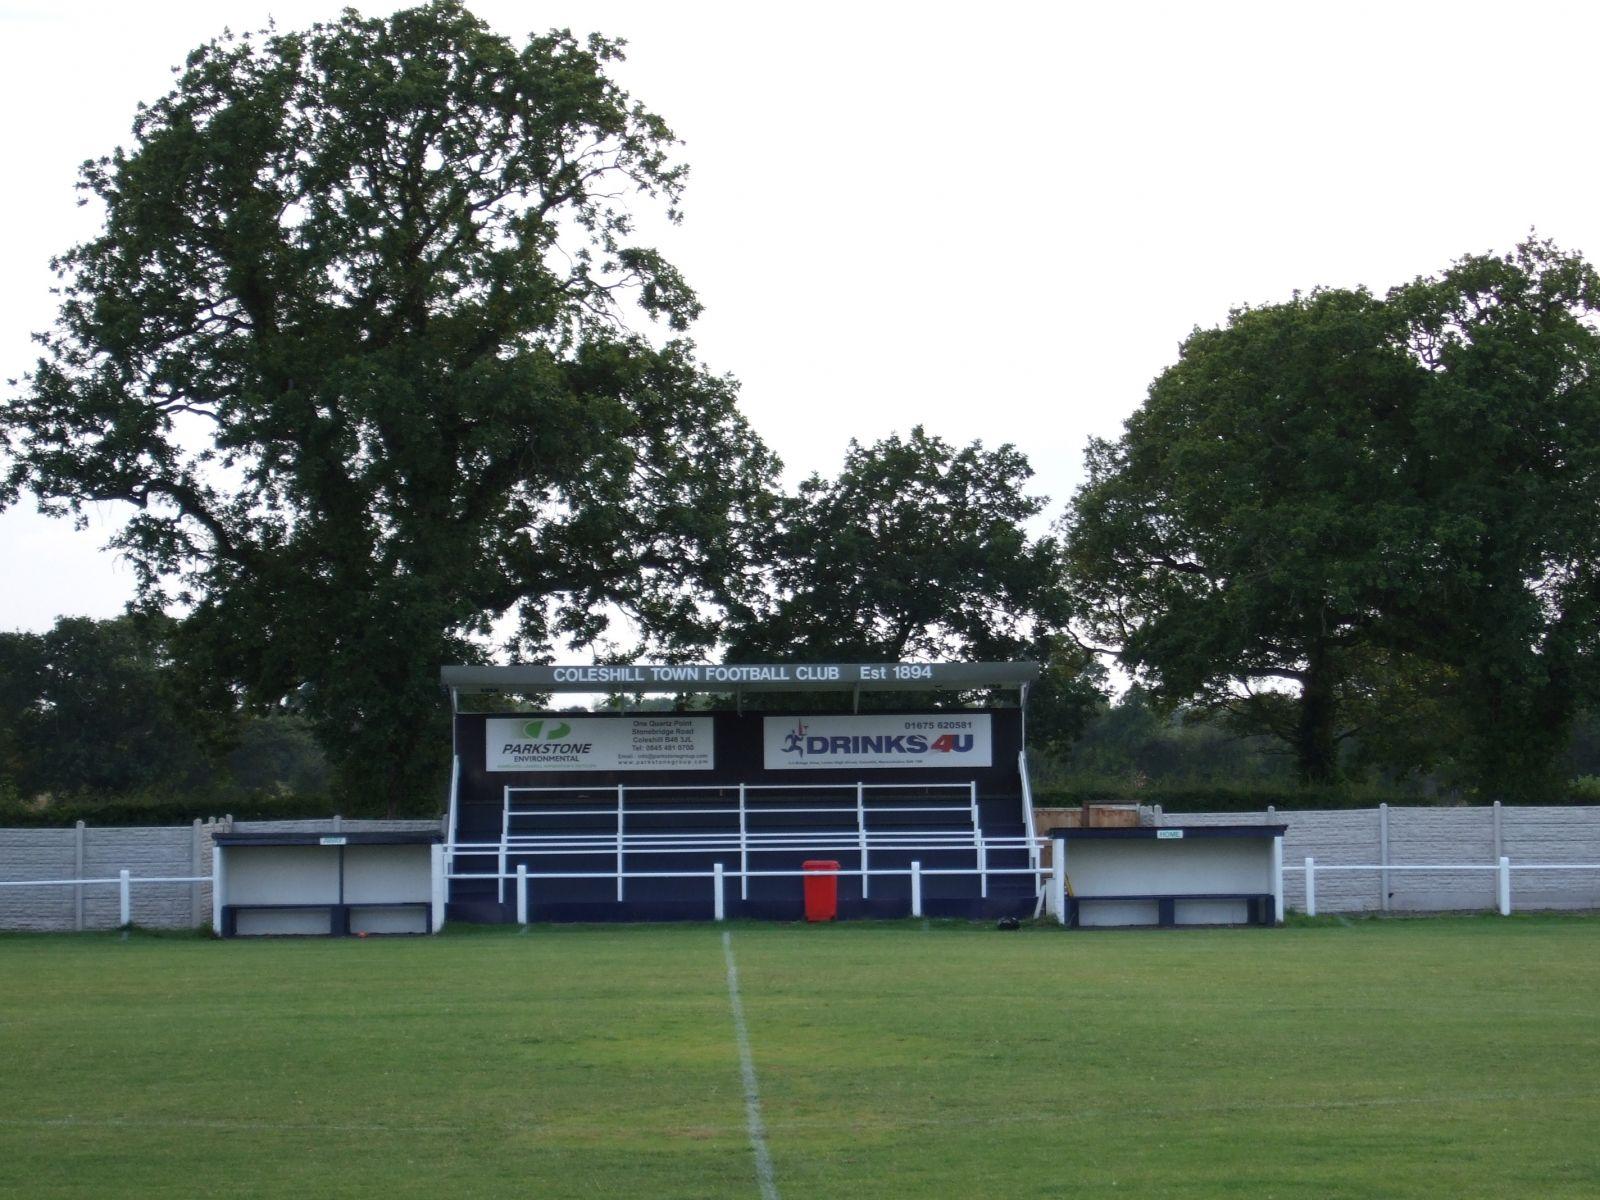 20140805 MFLP Coleshill Town 1 Long Eaton United 1